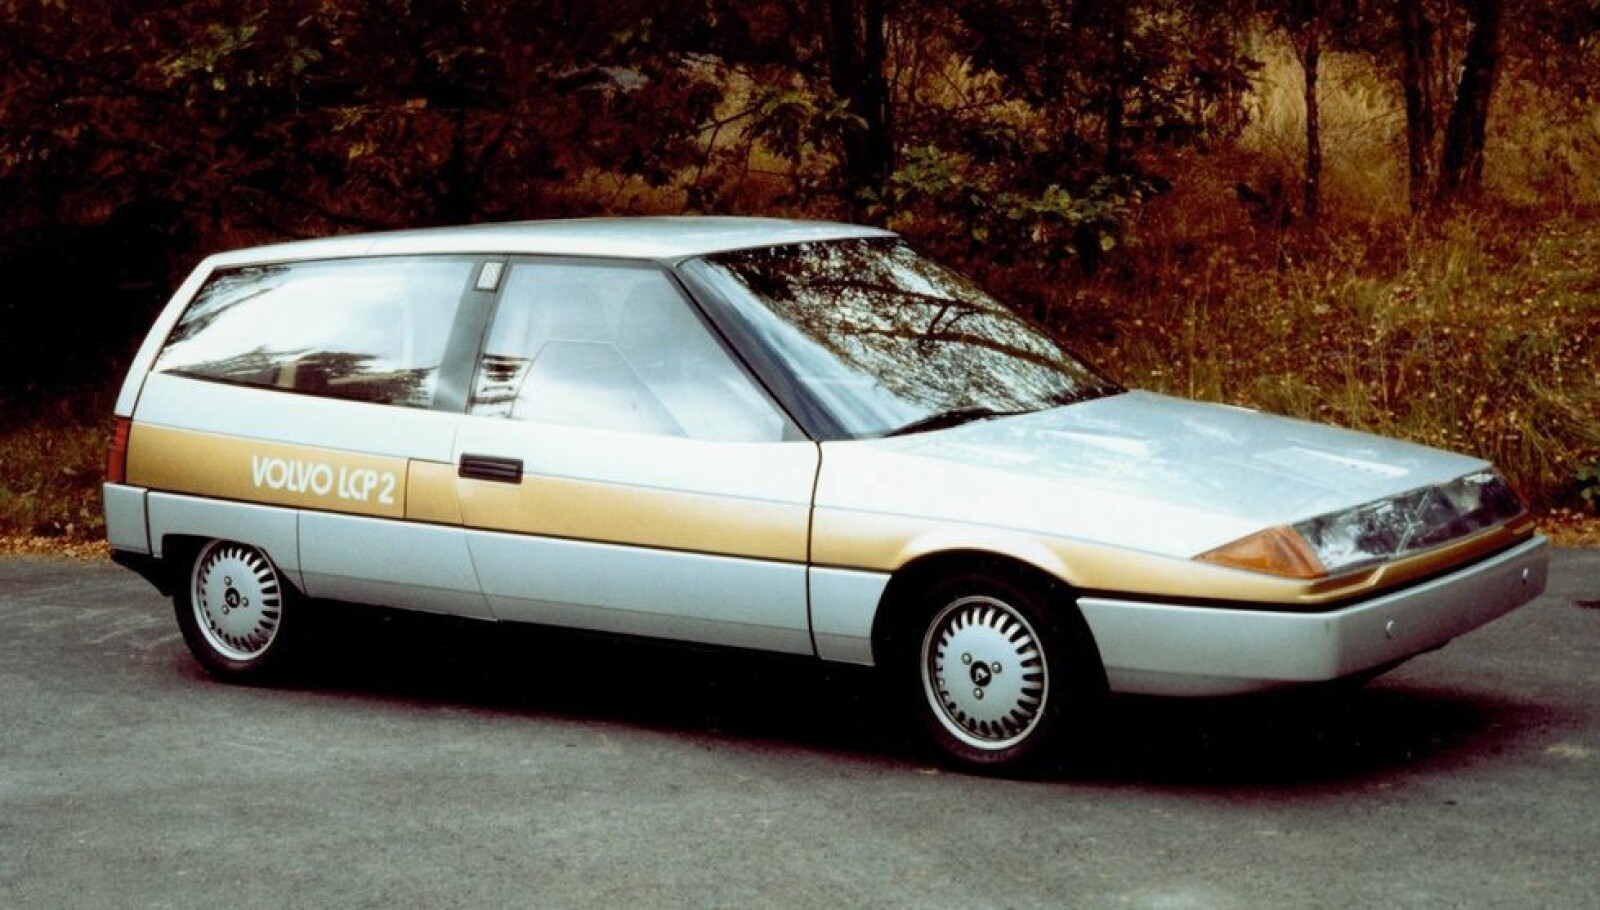 <b><SPAN CLASS=BOLD><STRONG>LETTVEKTER:</b></strong></span> Volvo Light Component Project 2000 resulterte i en bil som lå langt forut sin tid. Den veide bare 700 kilo og var en ladbar hybrid.